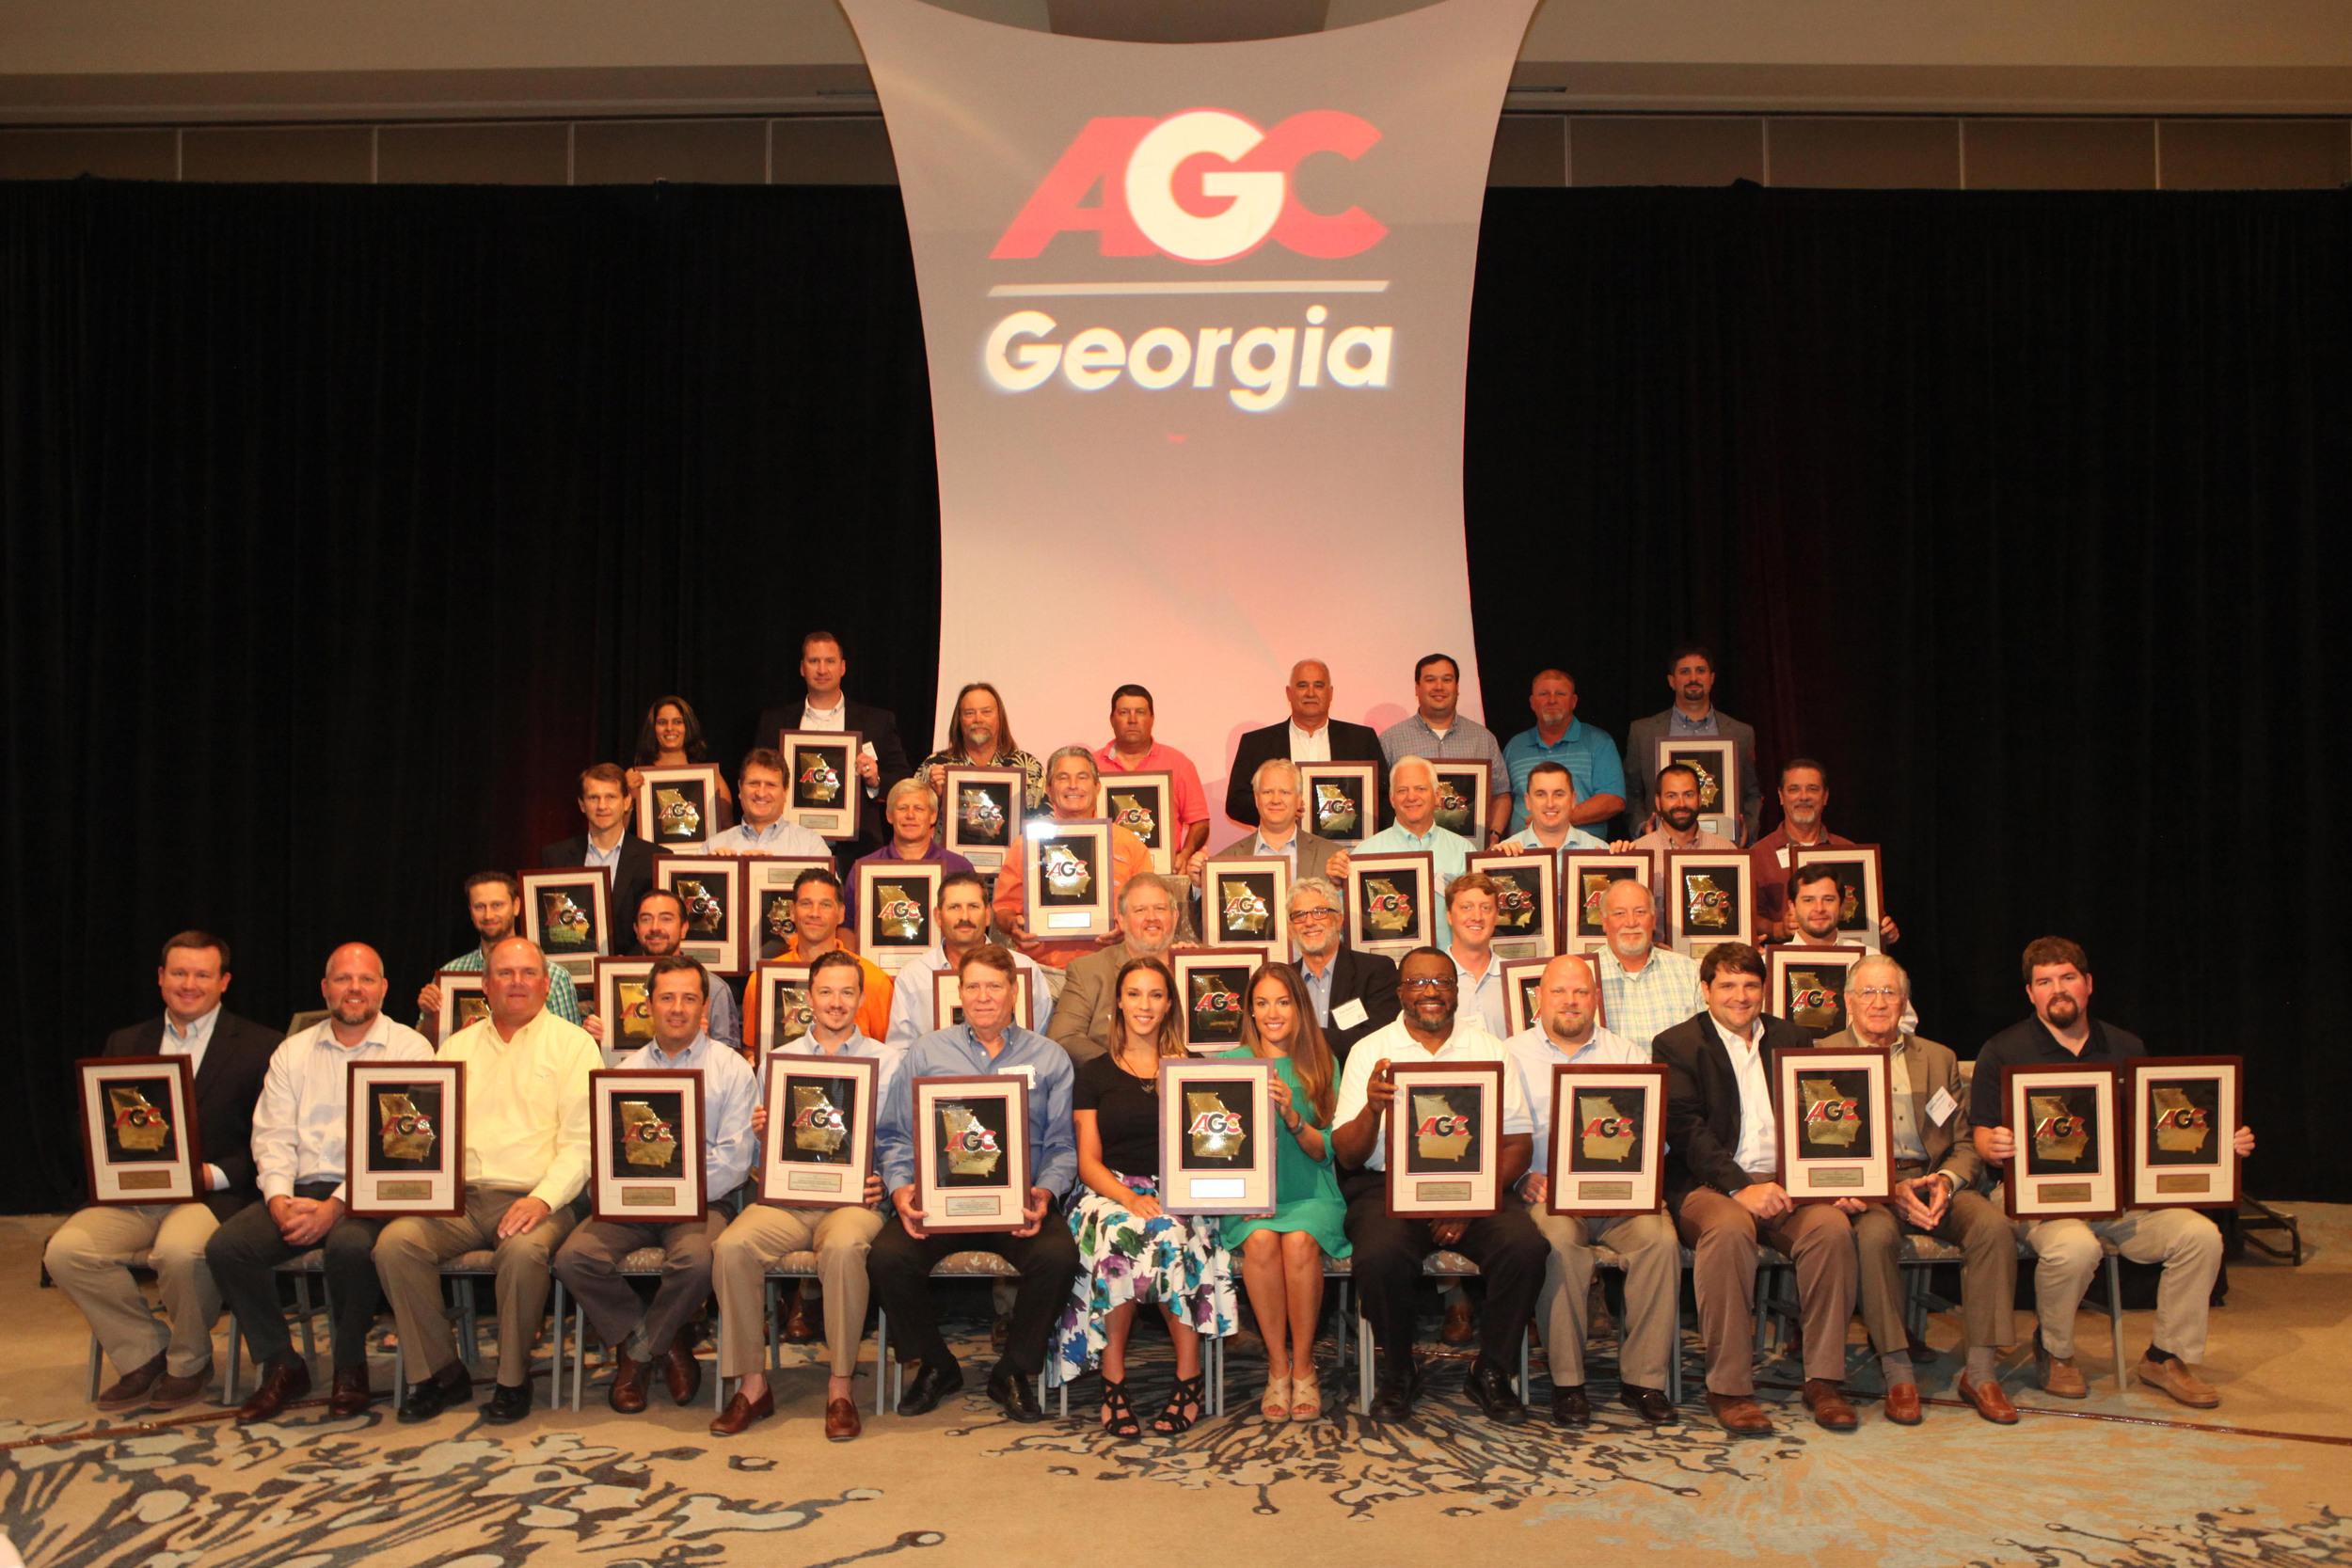 2016 AGC Award Winners